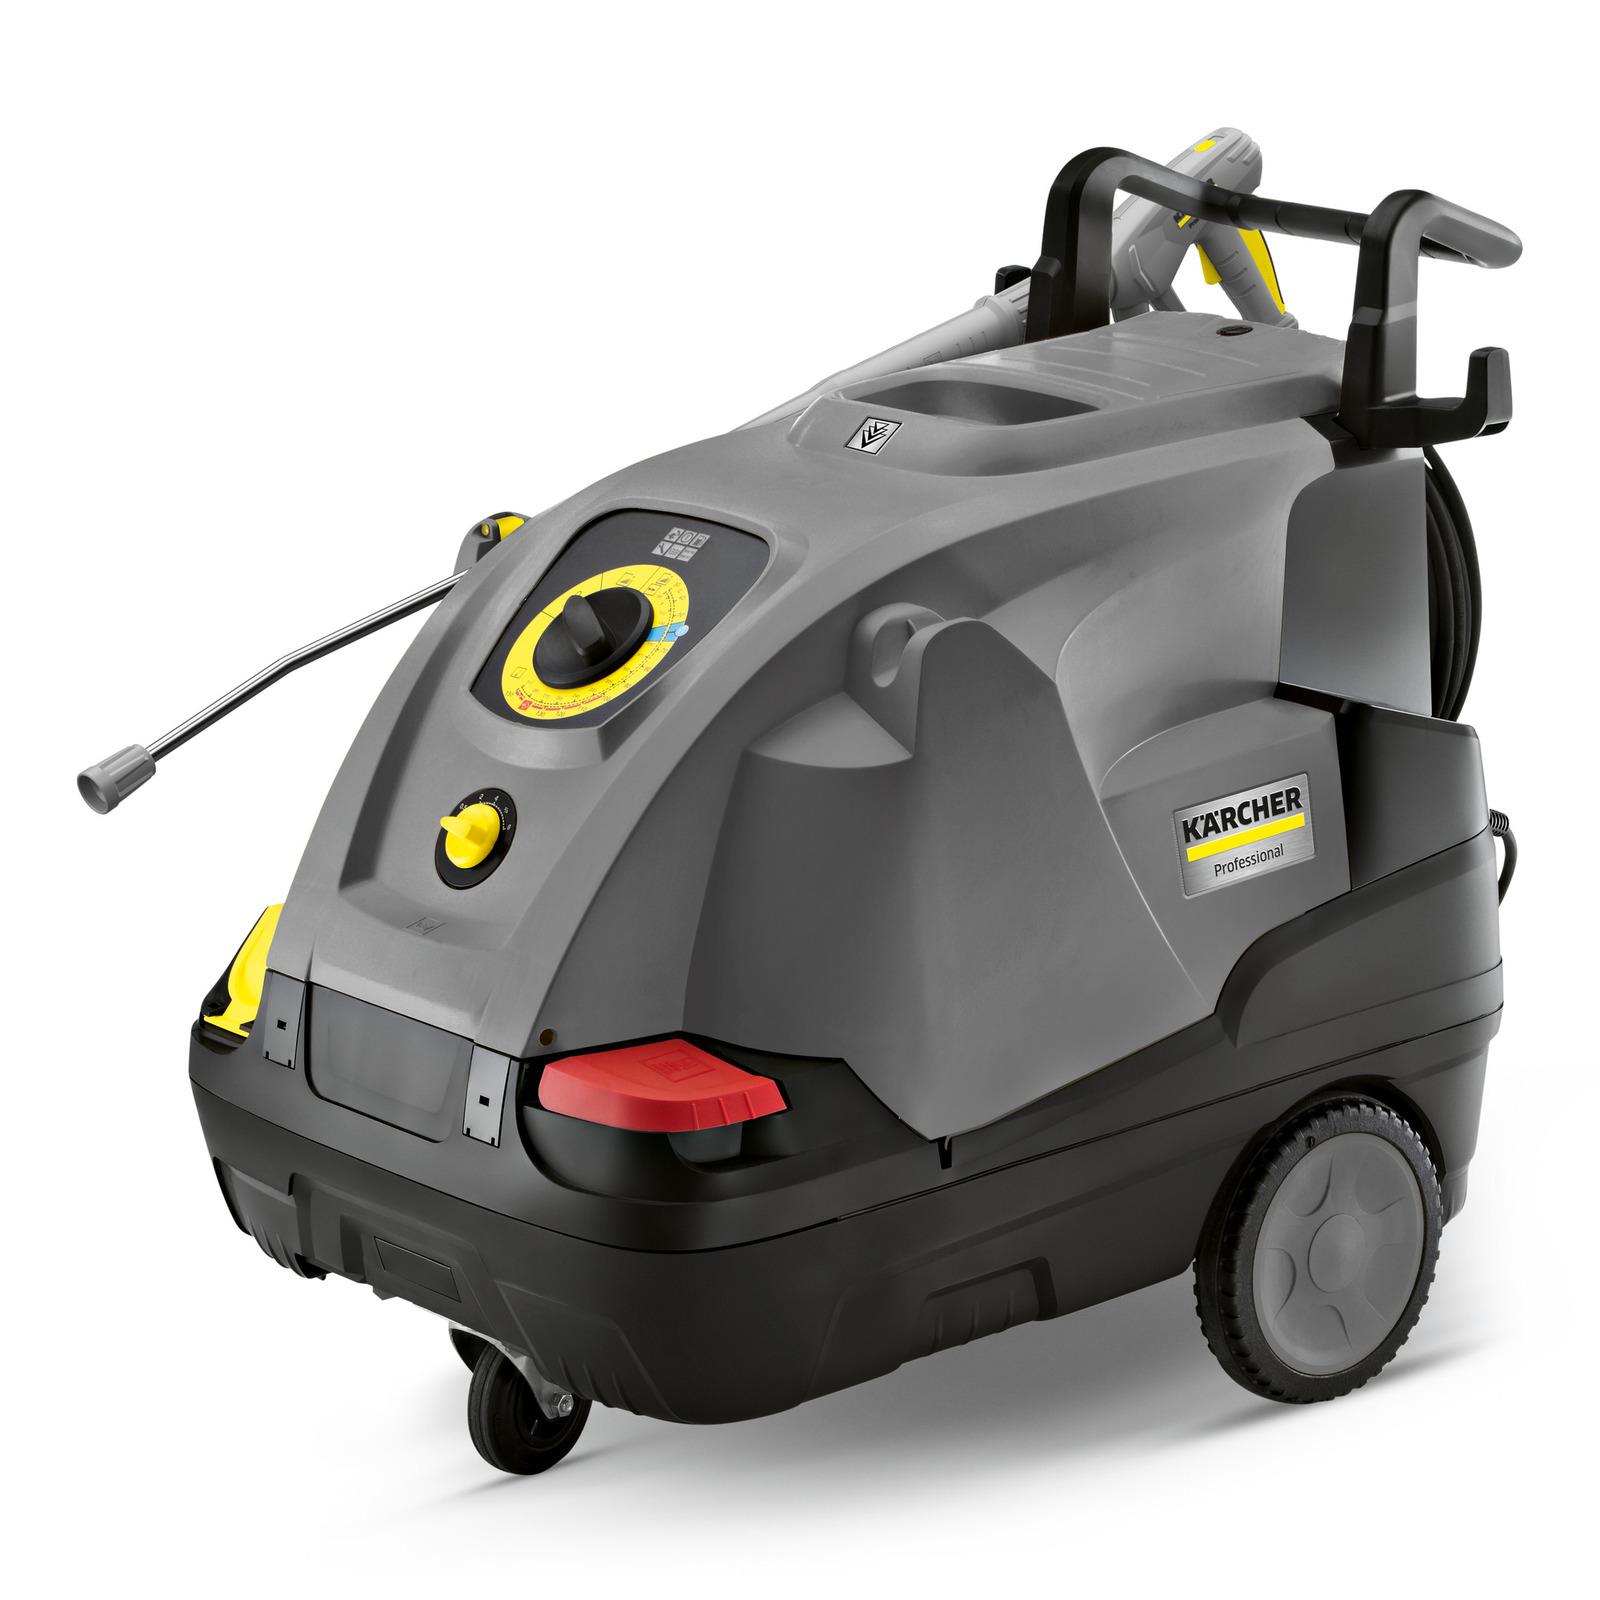 ... https://www.kaercher .com/za/professional/high-pressure-cleaners/hot-water-high-pressure-cleaners/compact-class/ hds-8-18-4-c-classic-11749030.html The ...